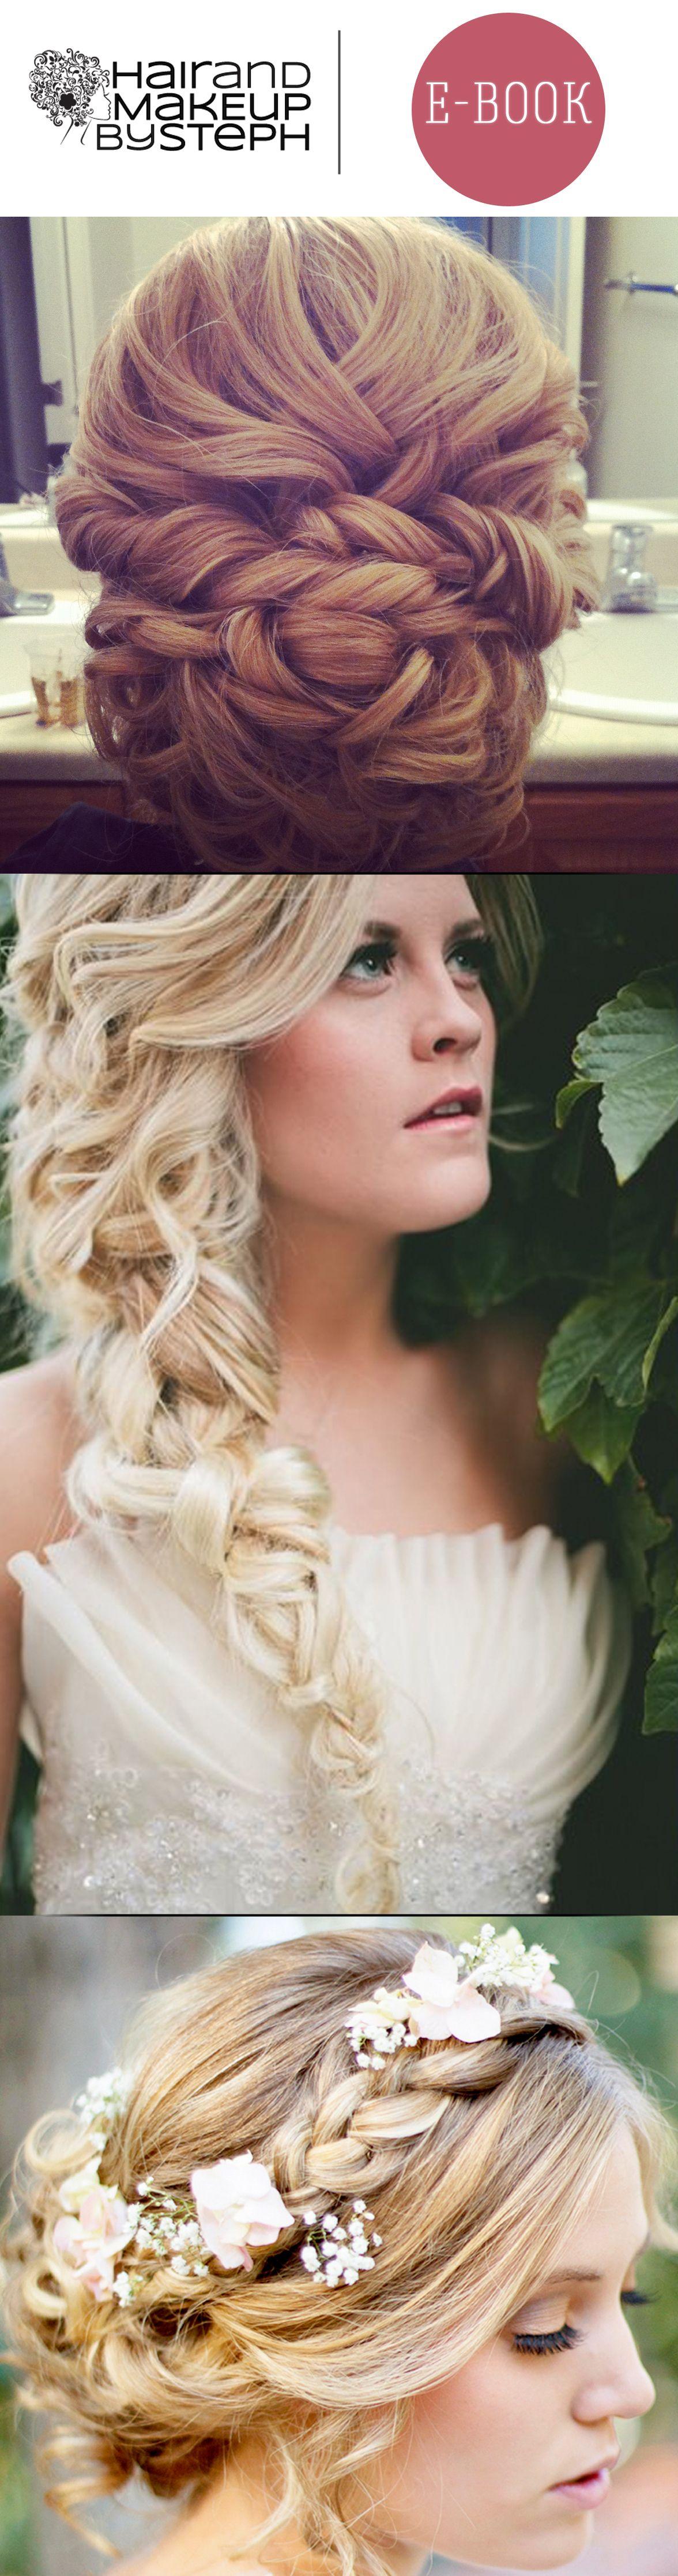 Ebook updos tutorials and makeup